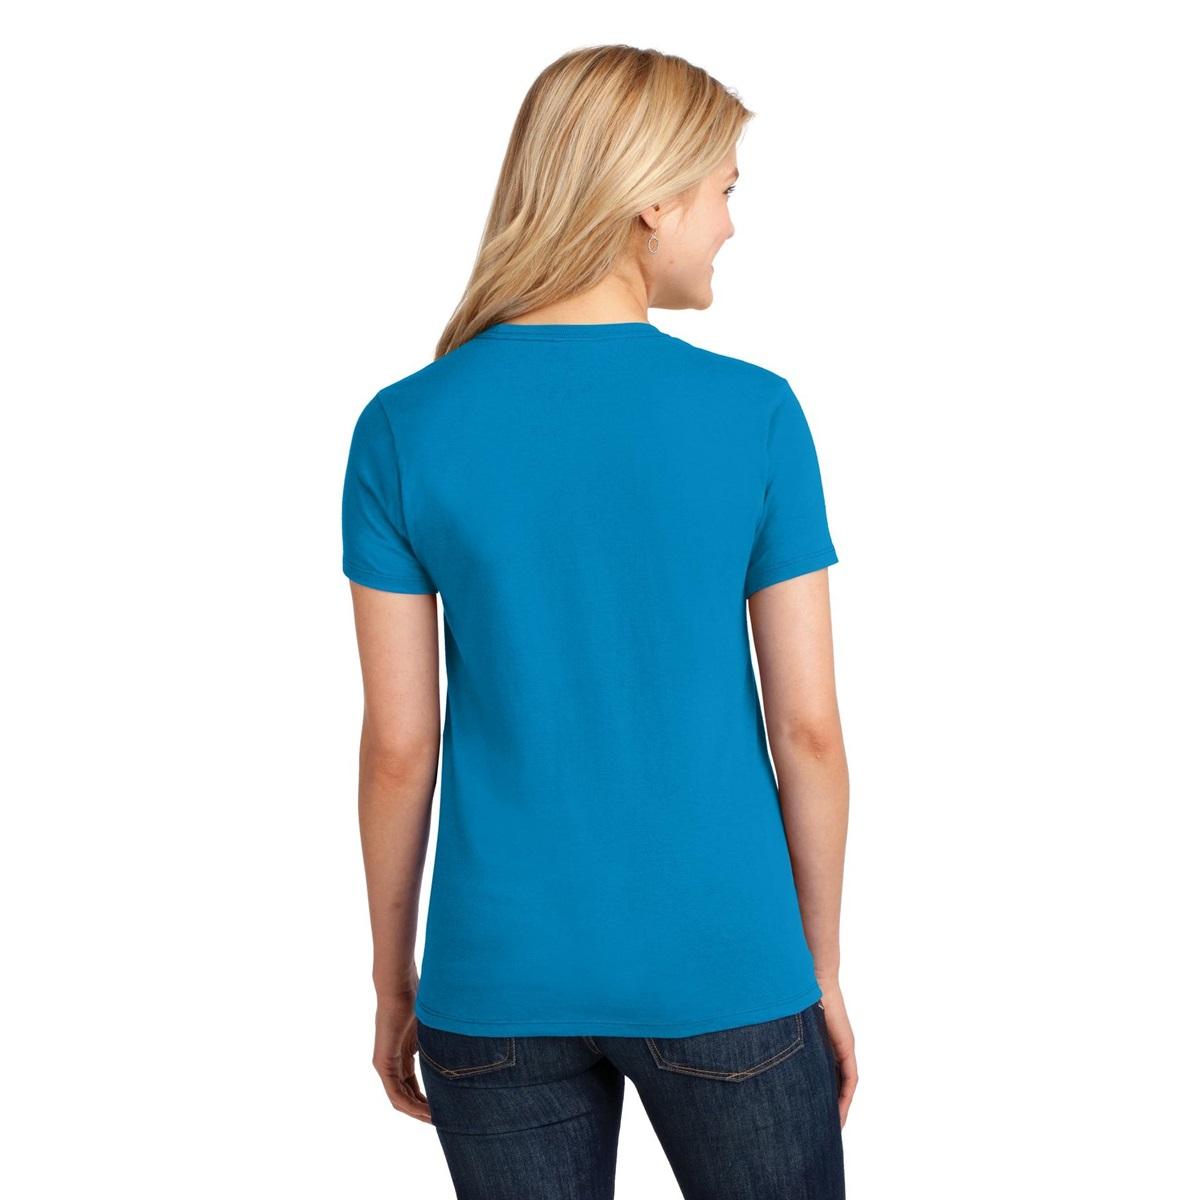 Port Company Lpc54 Ladies 5 4 Oz 100 Cotton T Shirt